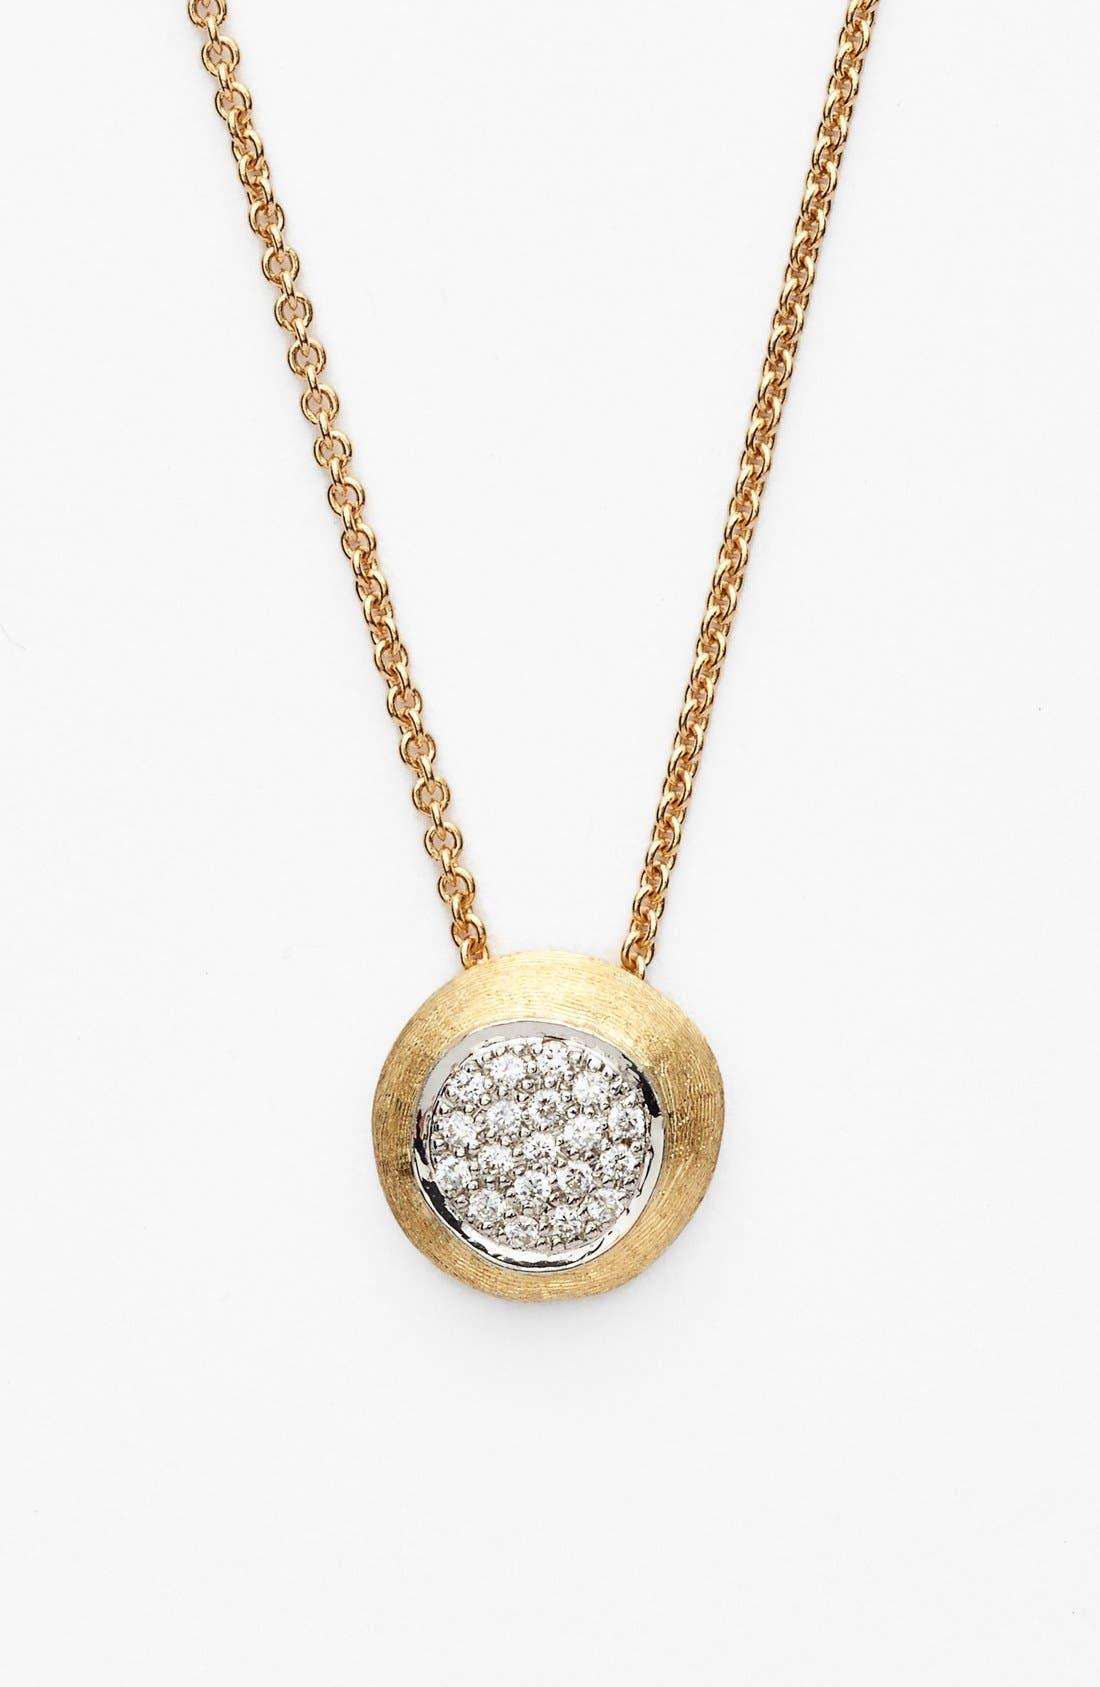 Marco Bicego 'Delicati - Jaipur' Diamond Pendant Necklace